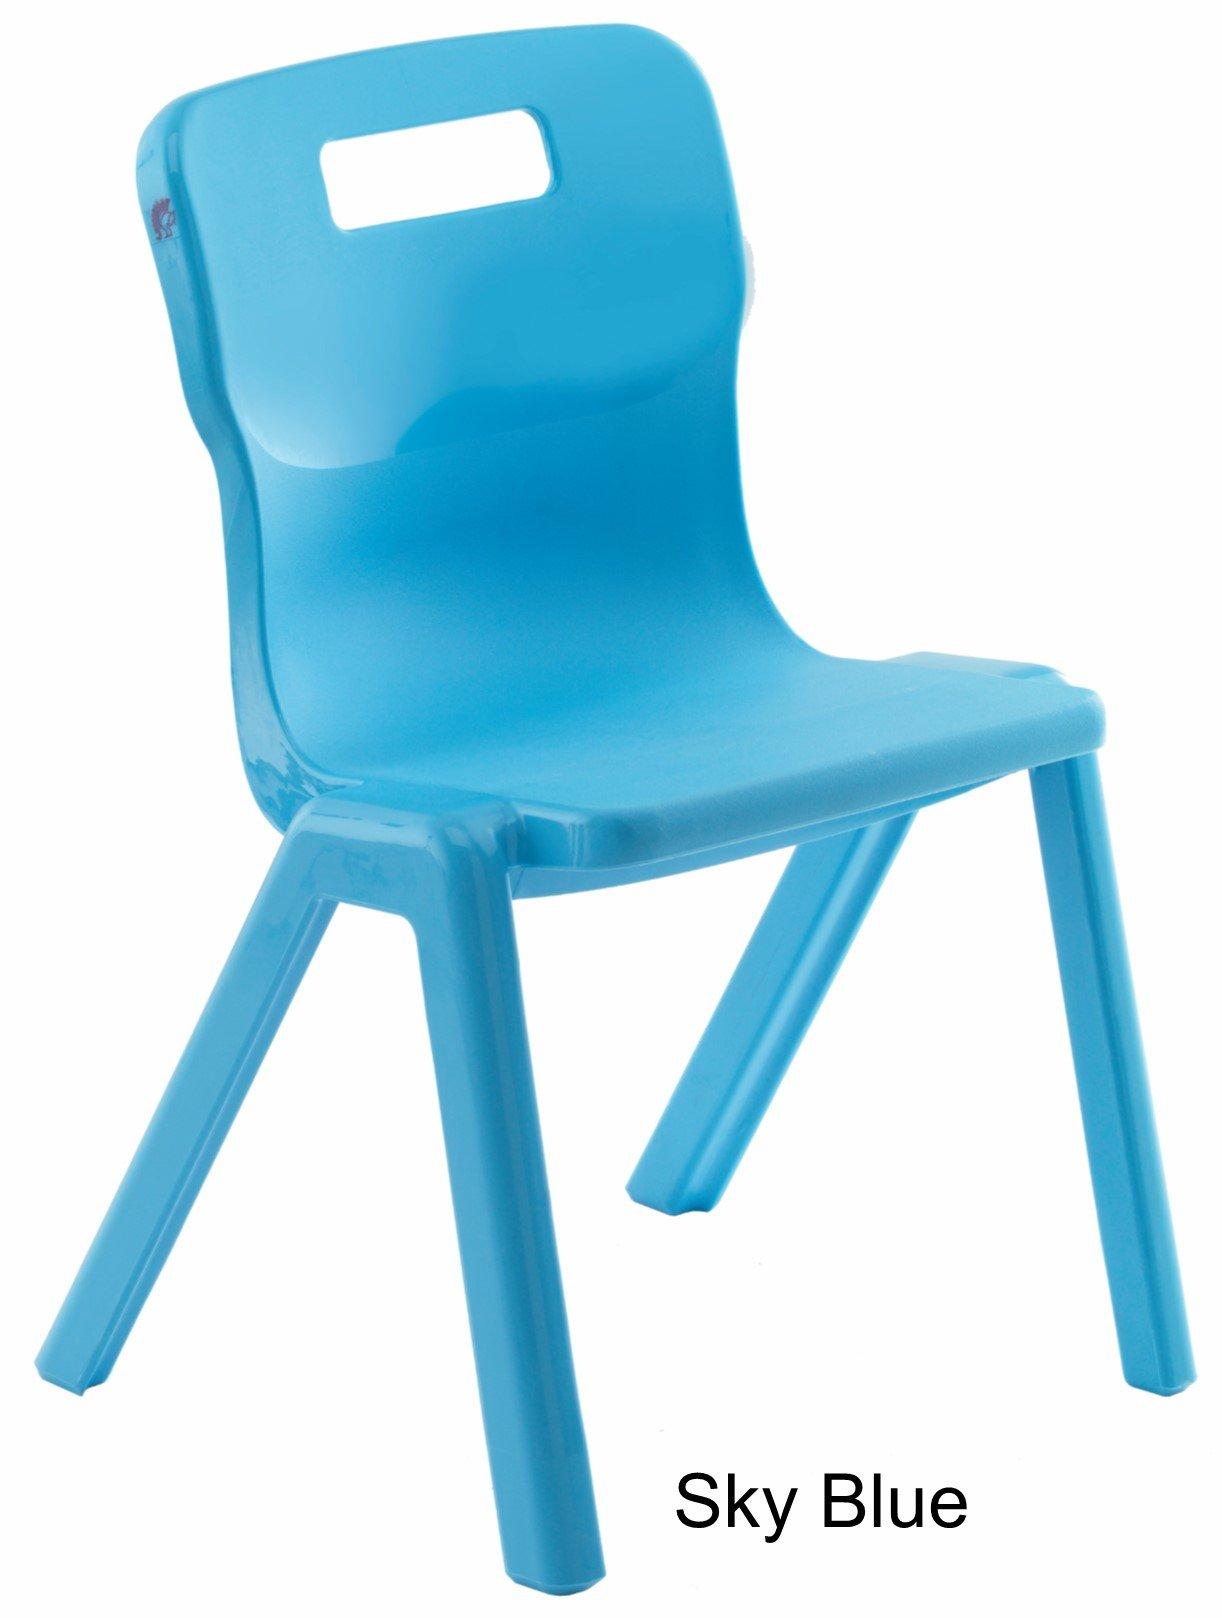 Exelent Plastic Tub Chairs Adornment Bathtub Ideas